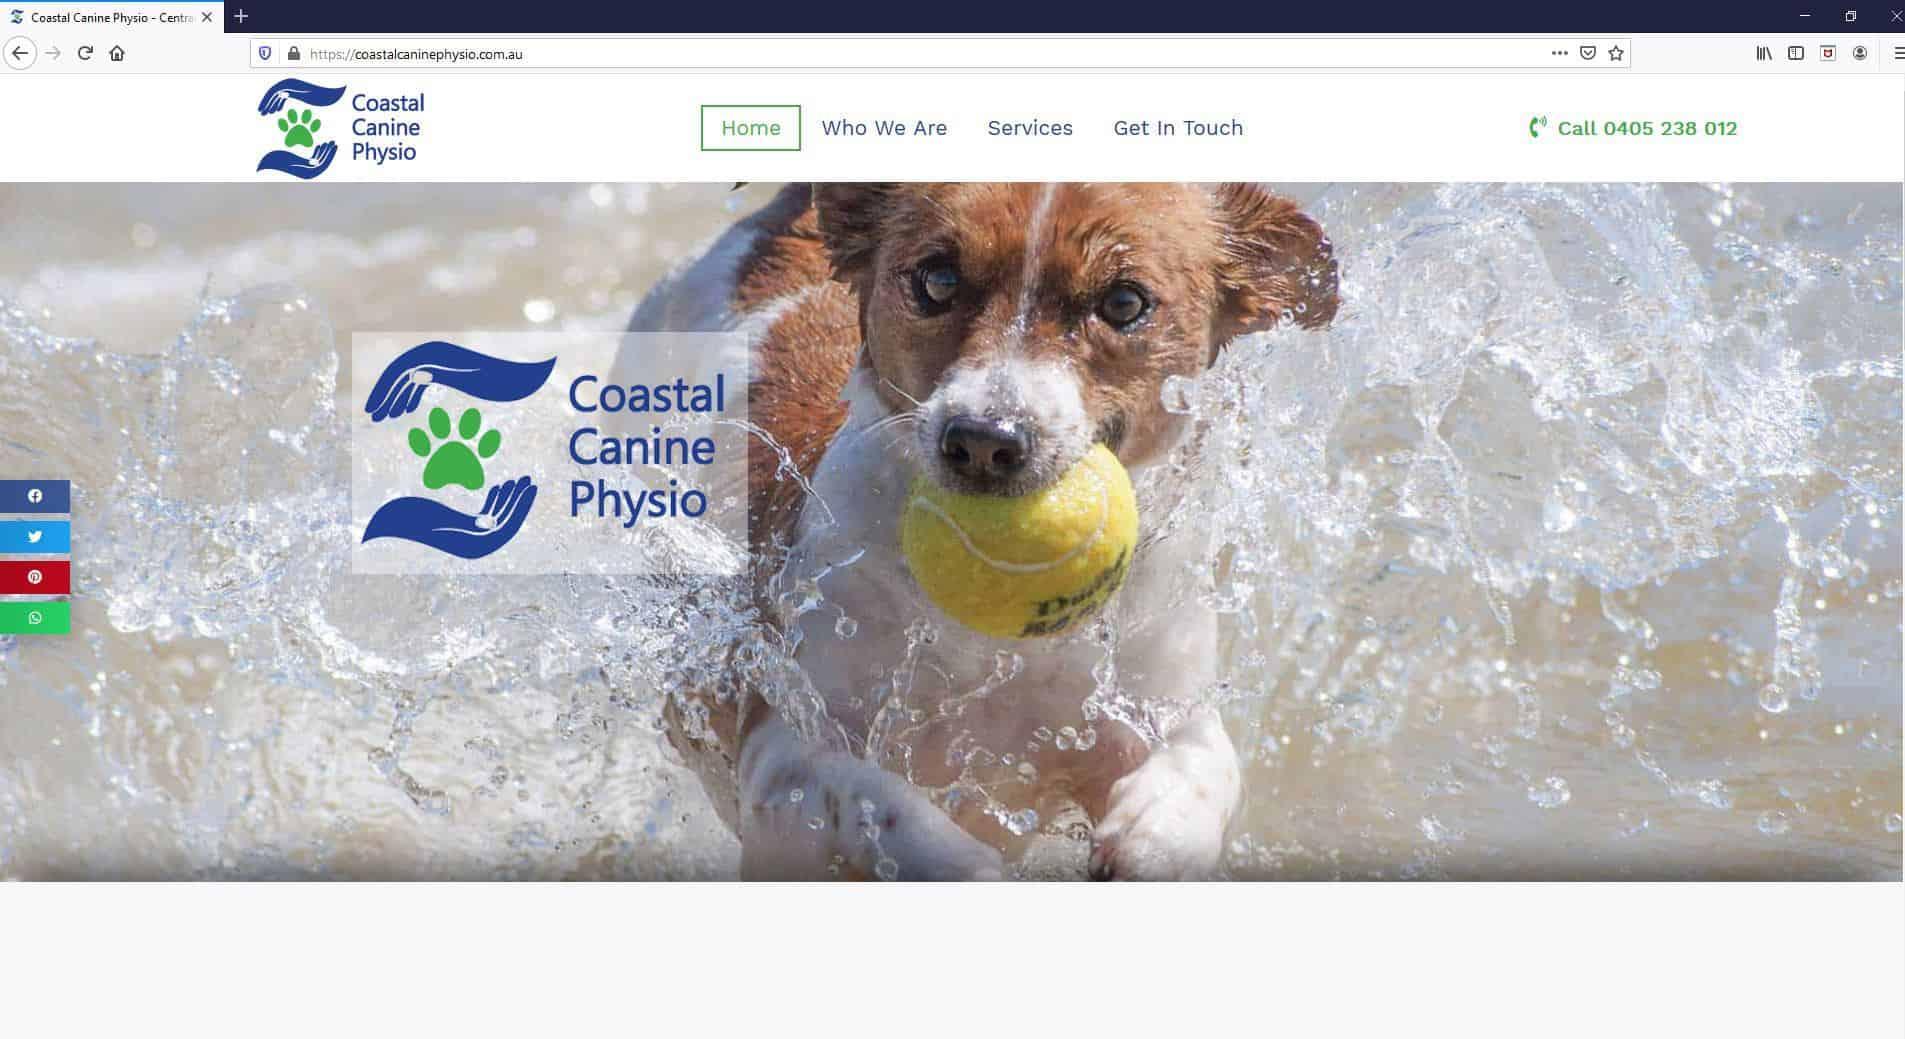 Coastal Canine Physio Website Screenshot